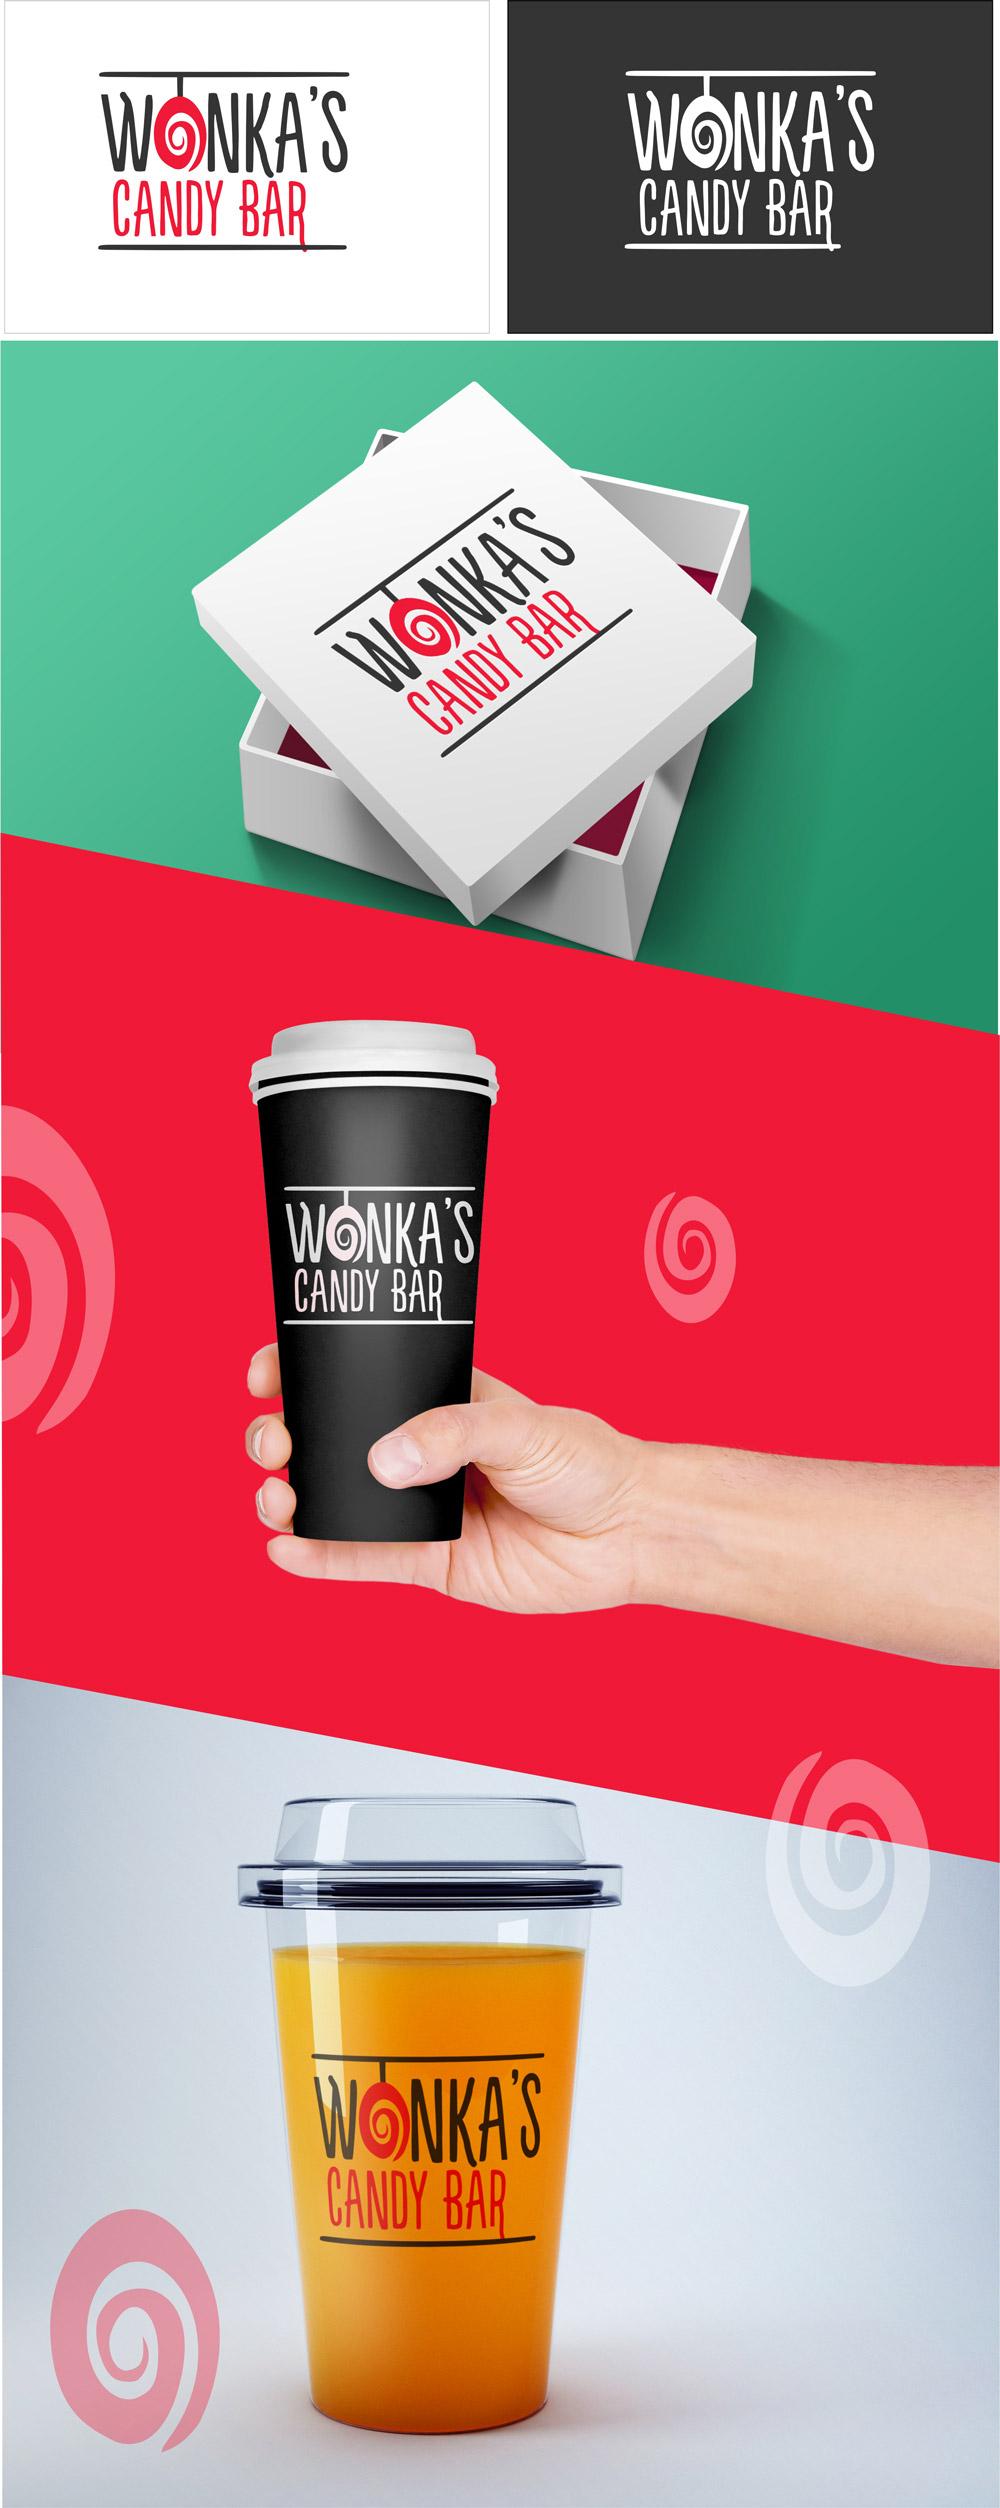 Разработка логотипа магазина сладостей со всего мира. фото f_9955a297a675fecd.jpg